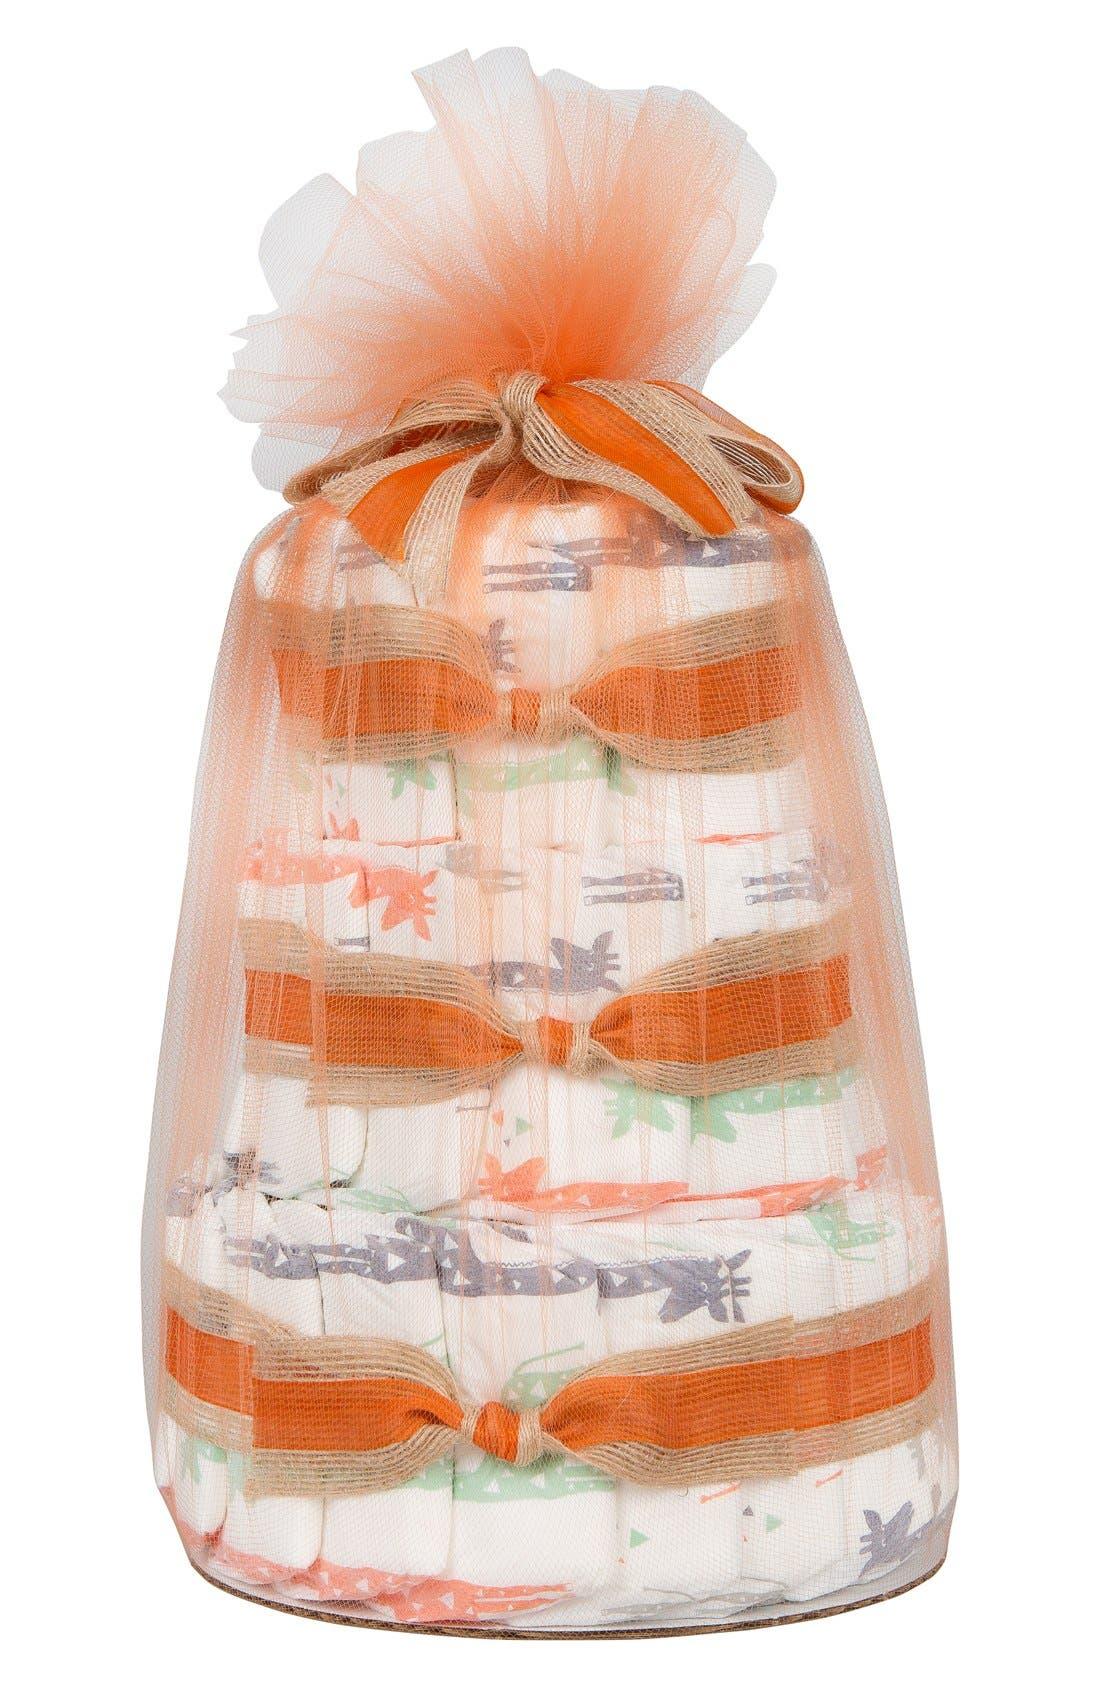 Mini Diaper Cake & Travel-Size Essentials Set,                             Main thumbnail 1, color,